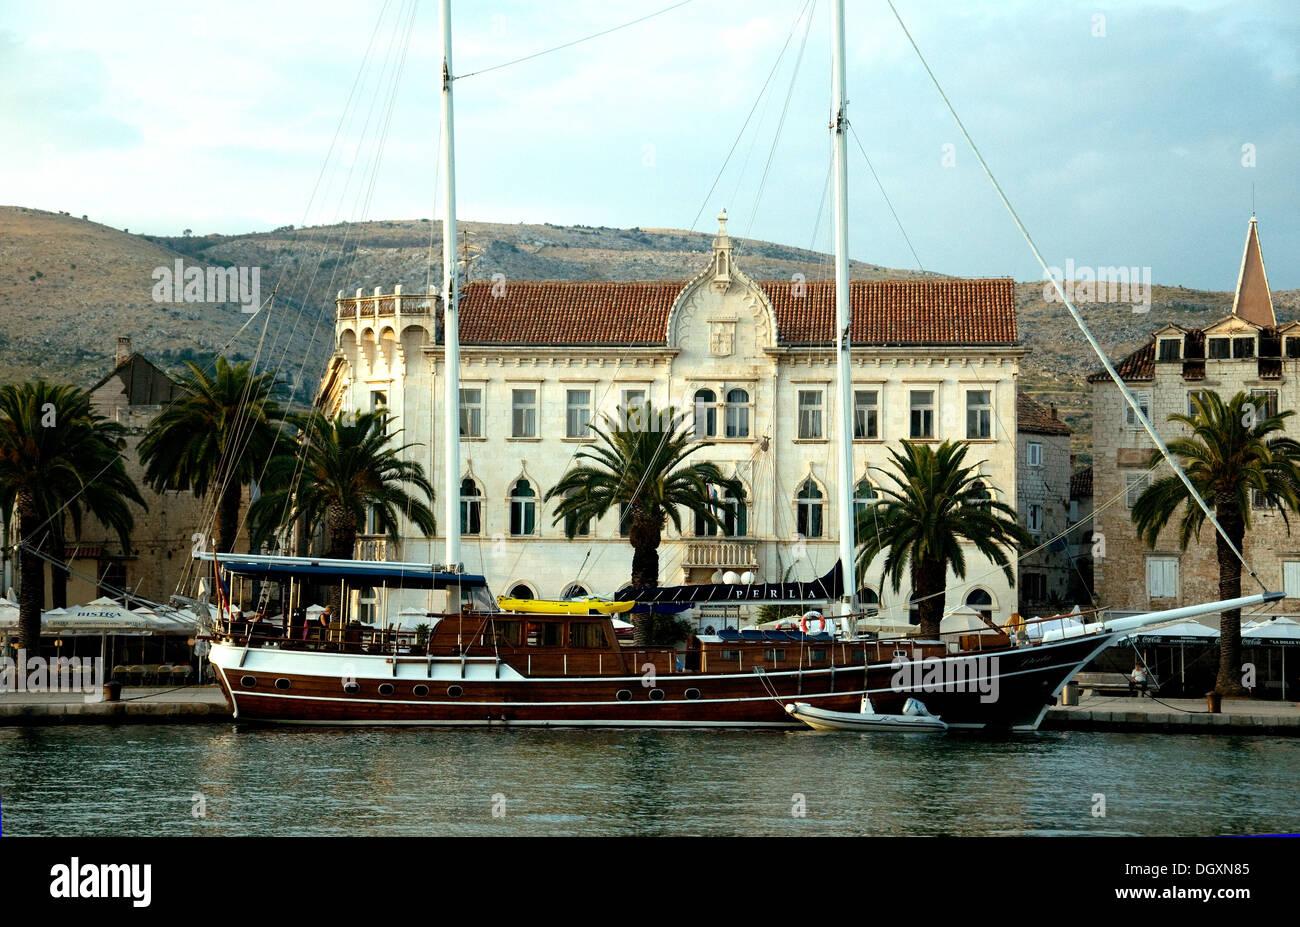 Venetian elegance dominates historic Trogir in Croatia's Dalmatian coast where a stylish gulet, sailing boat, adorns the quay - Stock Image